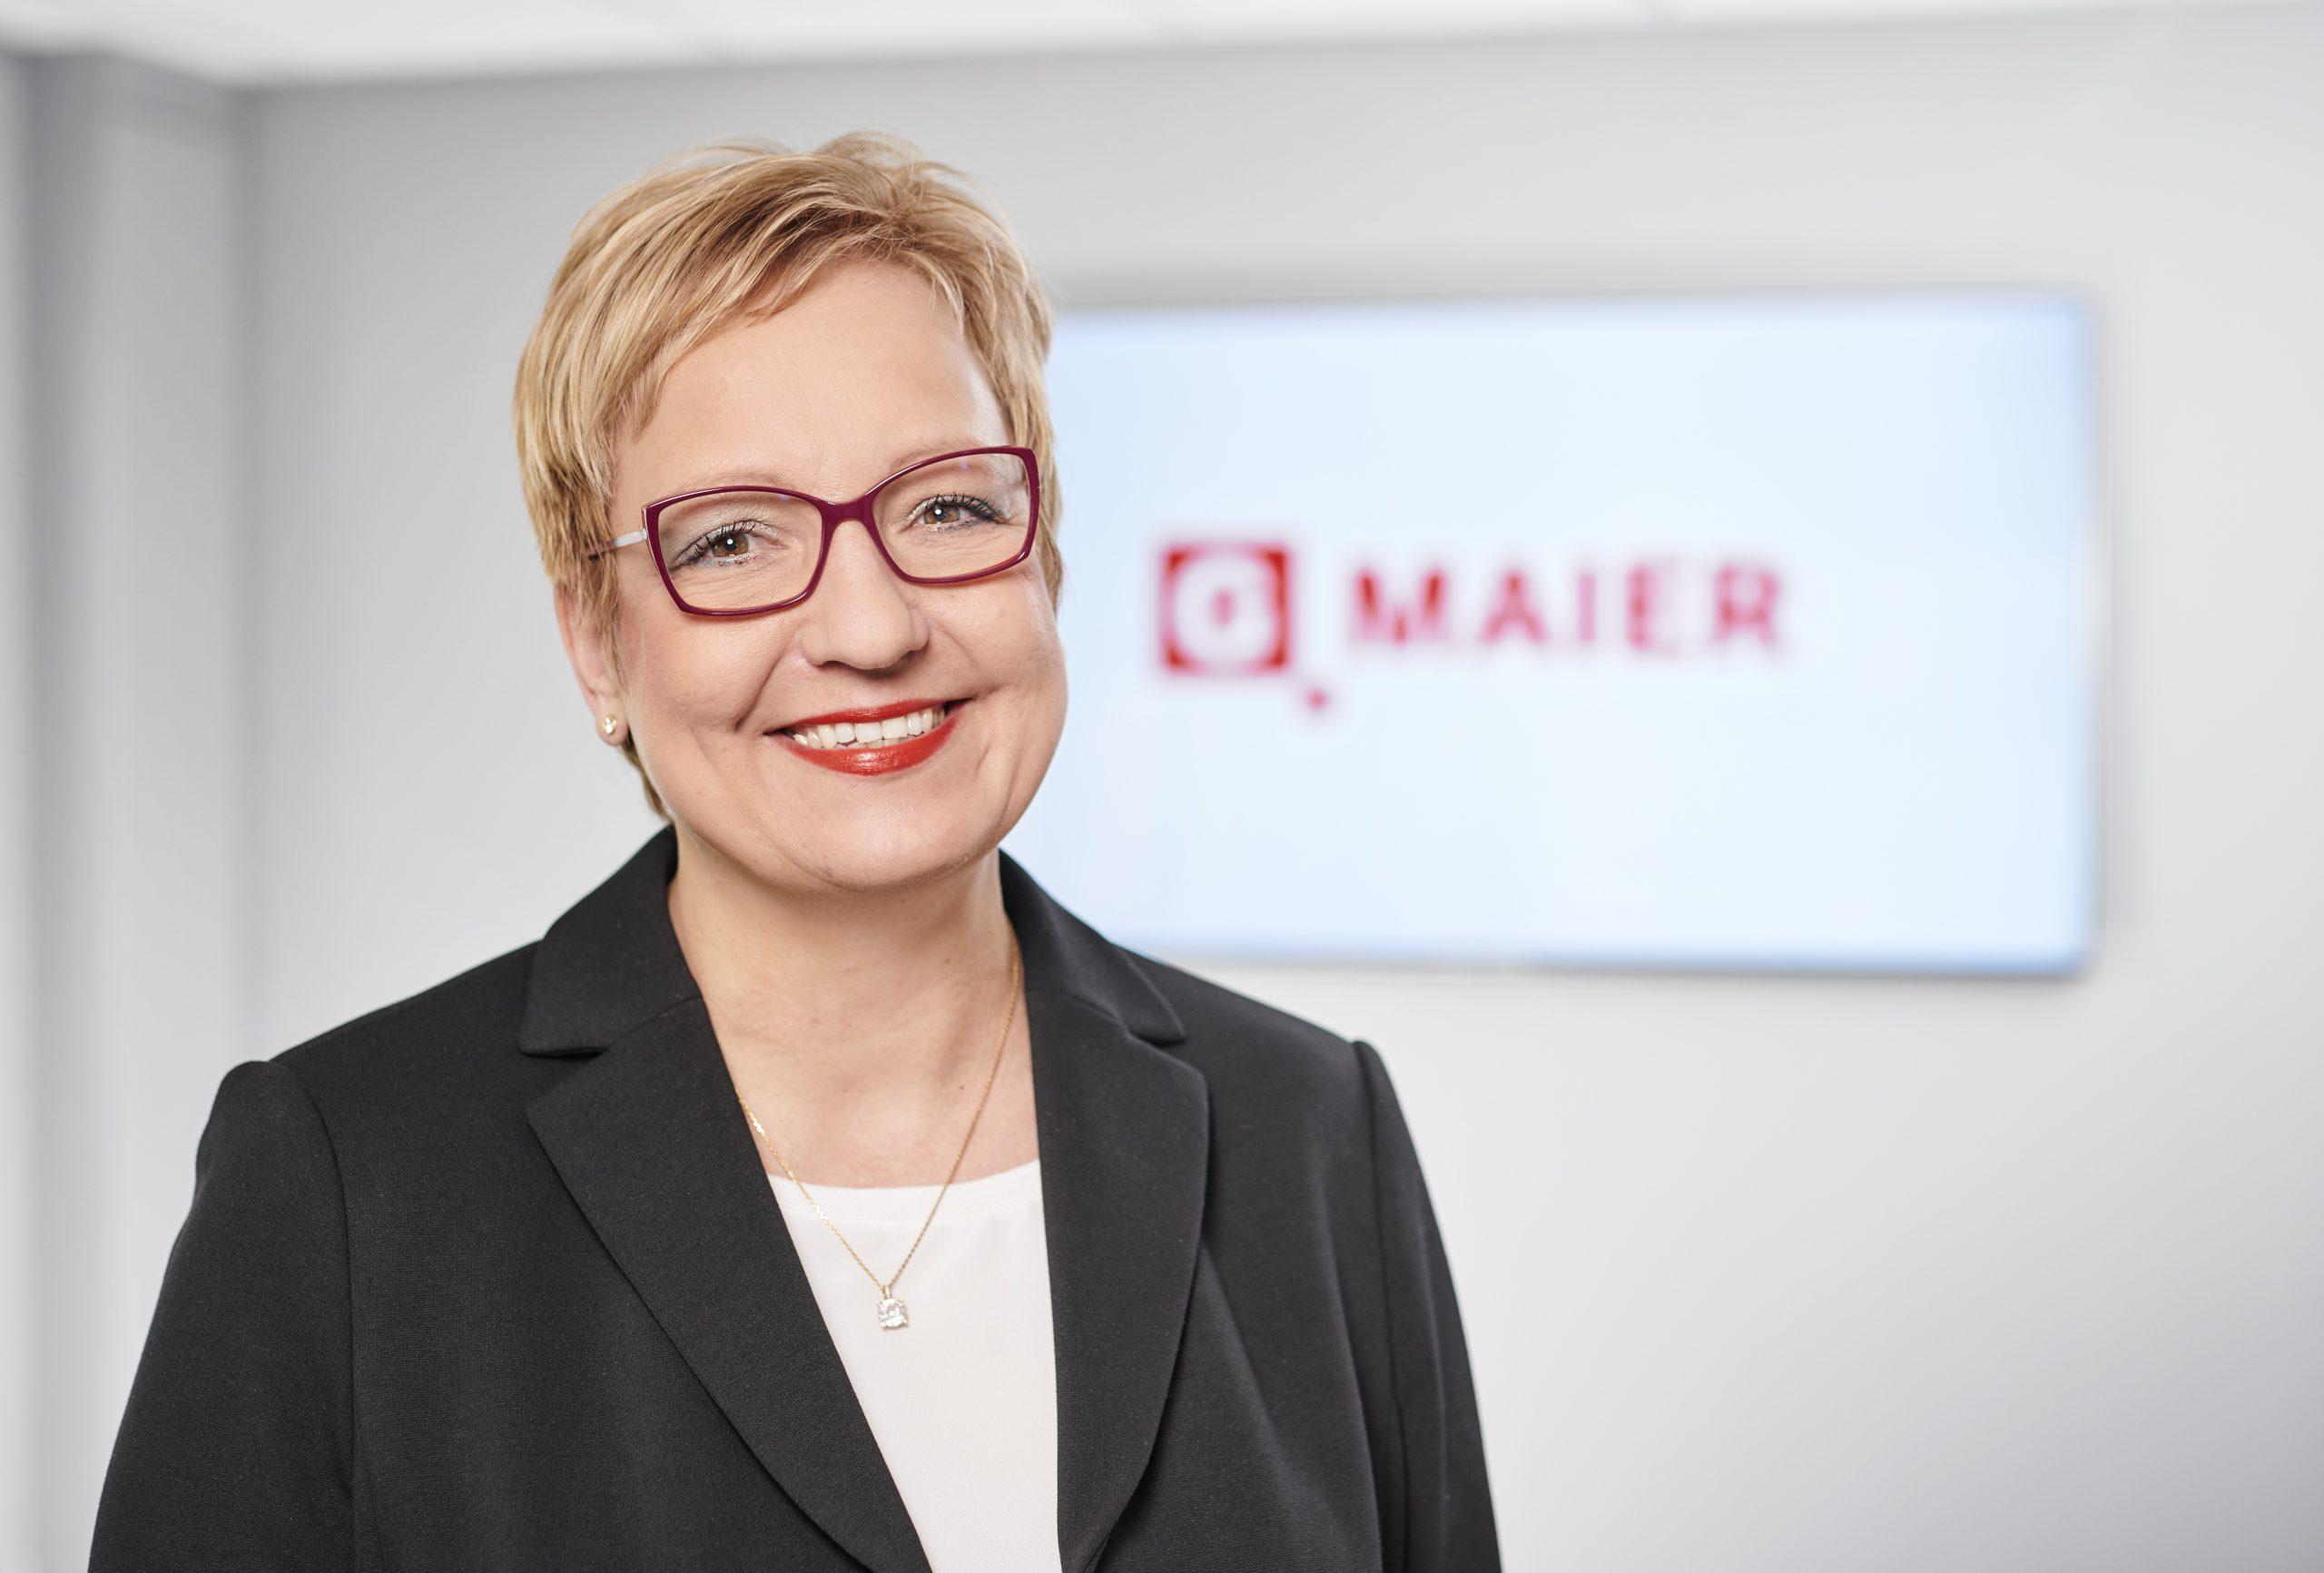 Kristin Maier-Müller